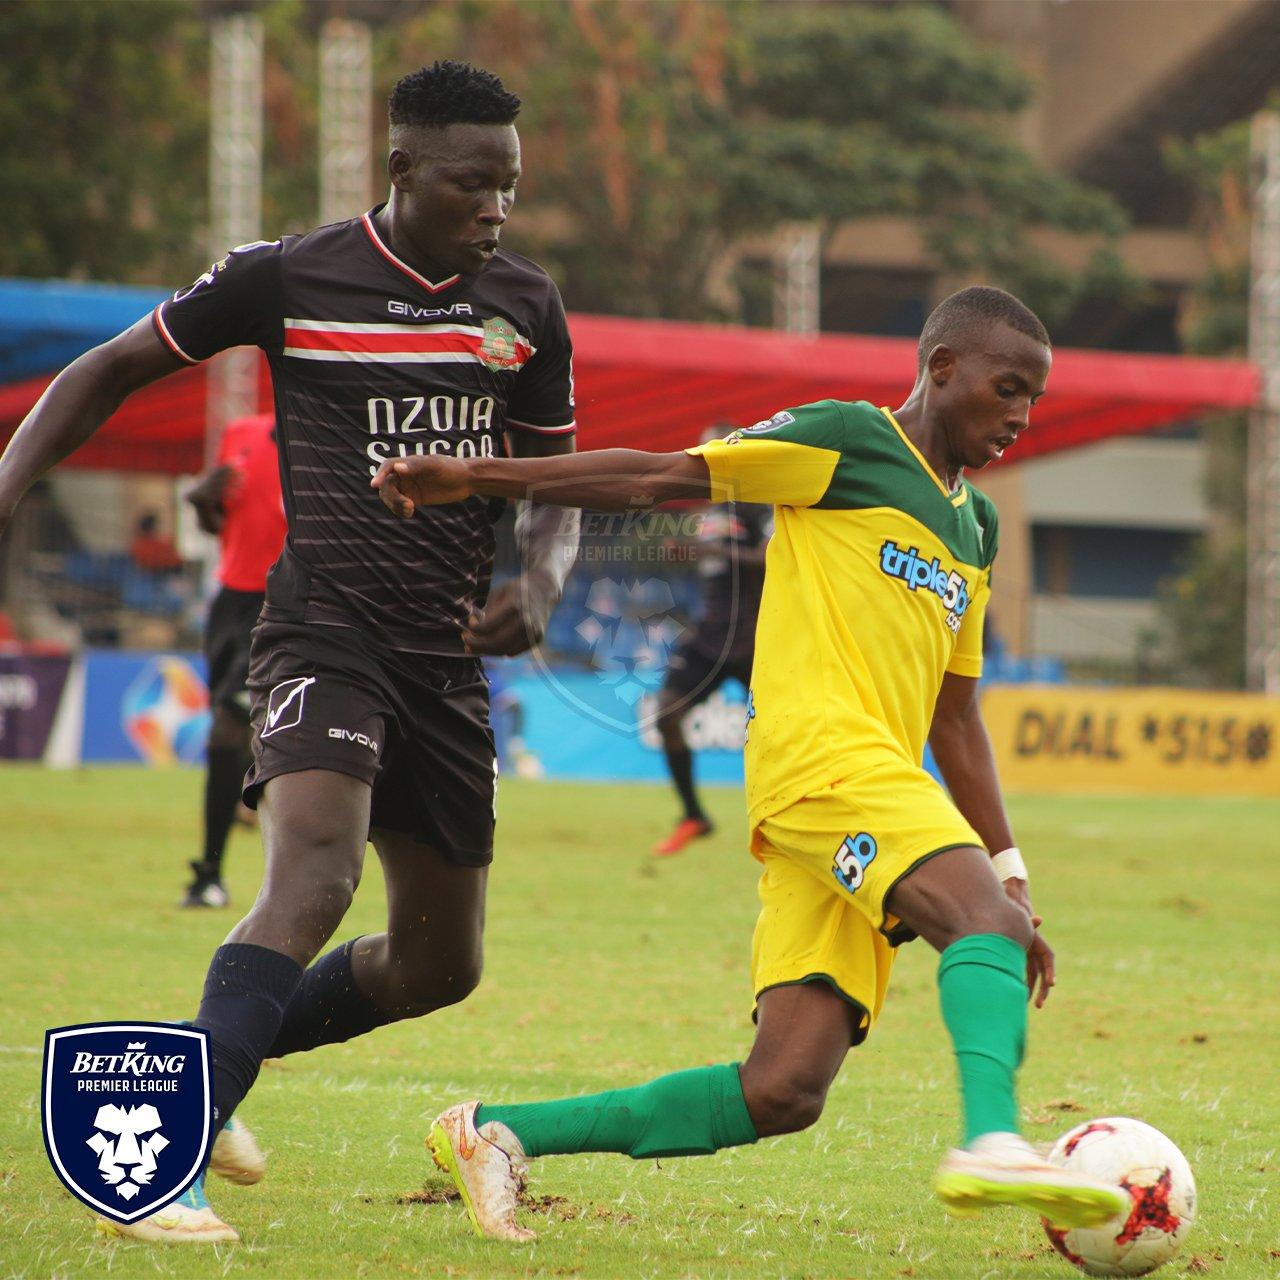 FKF Monday Wrap: Mathare edge Nzoia as Stima and Ulinzi draw in Kericho